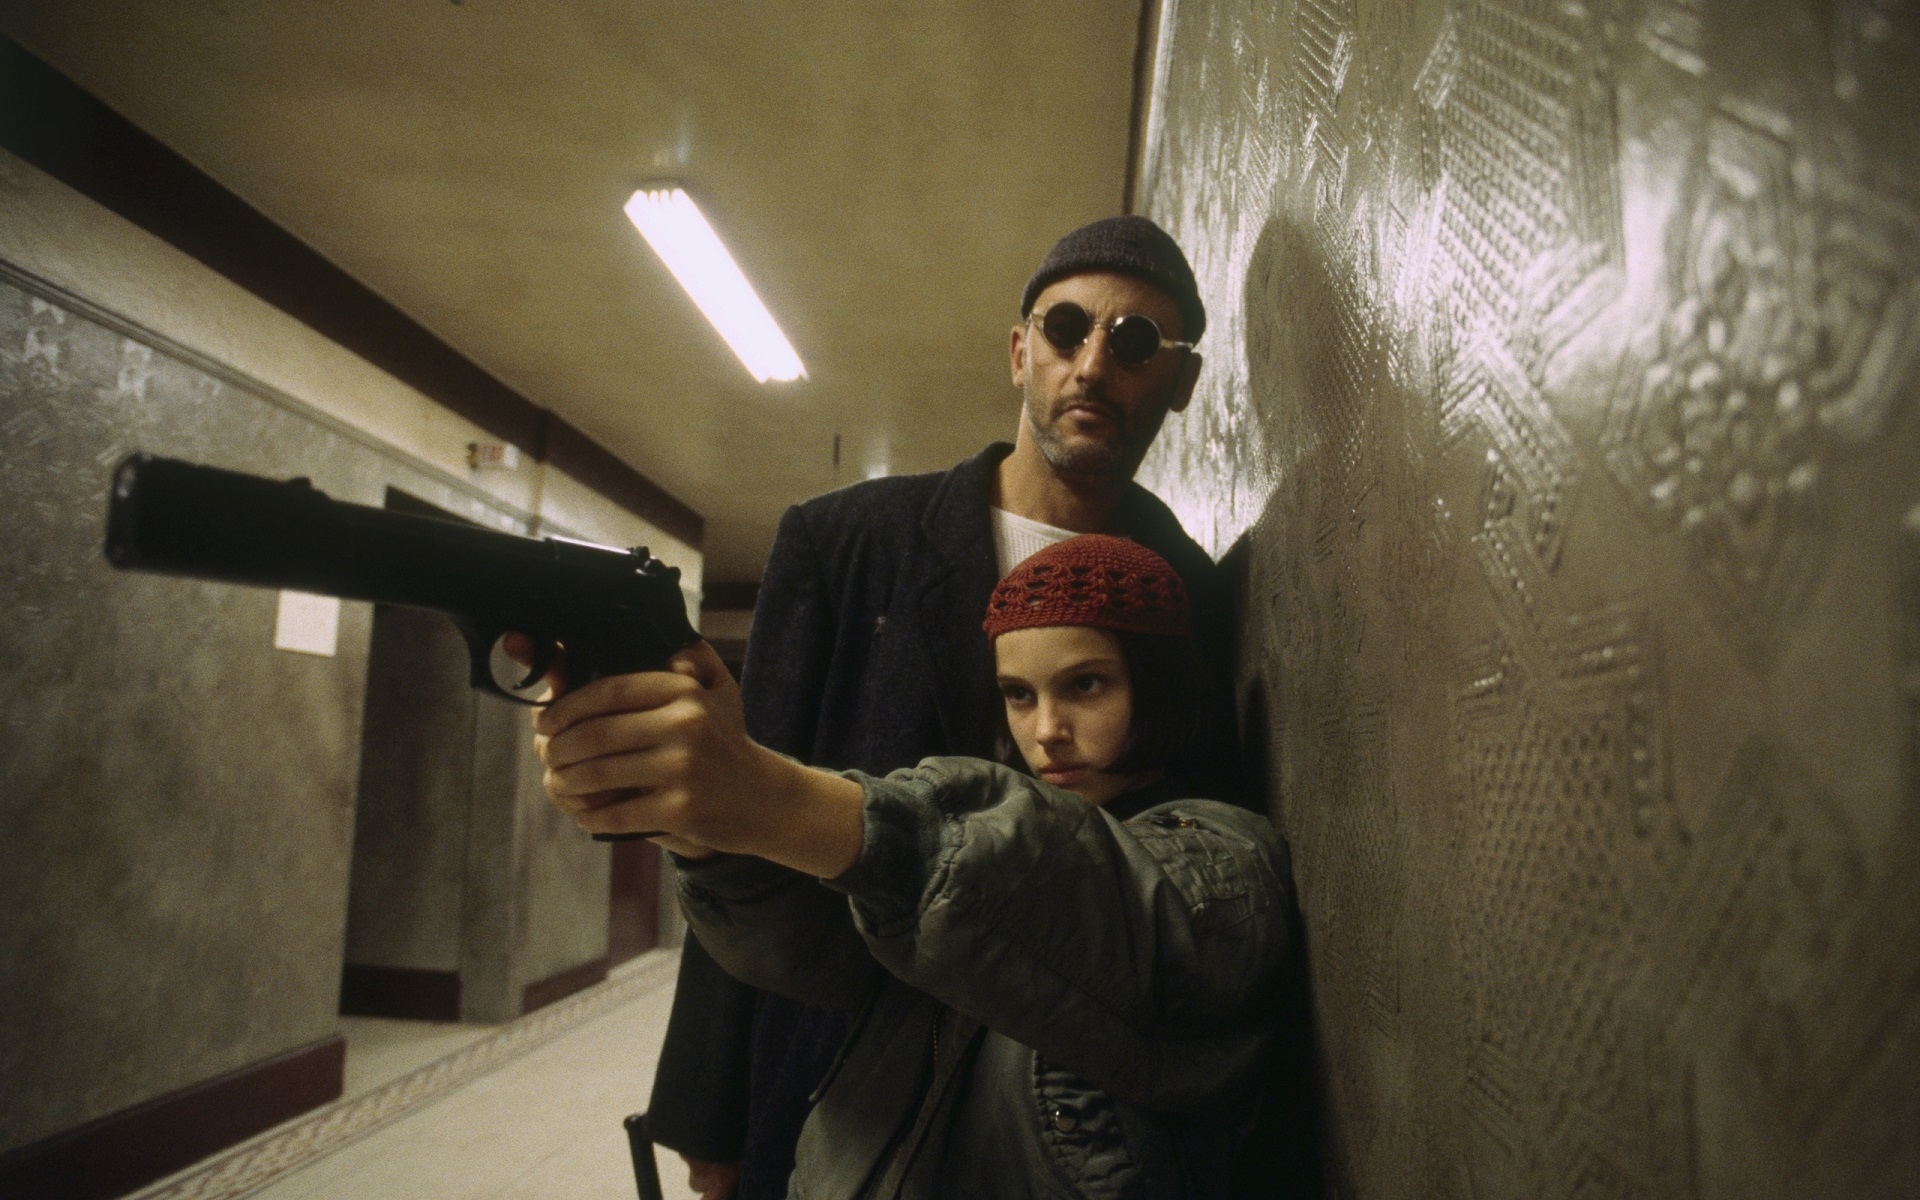 Leon The Professional Jean Reno Natalie Portman Movies Pistol 1920x1200